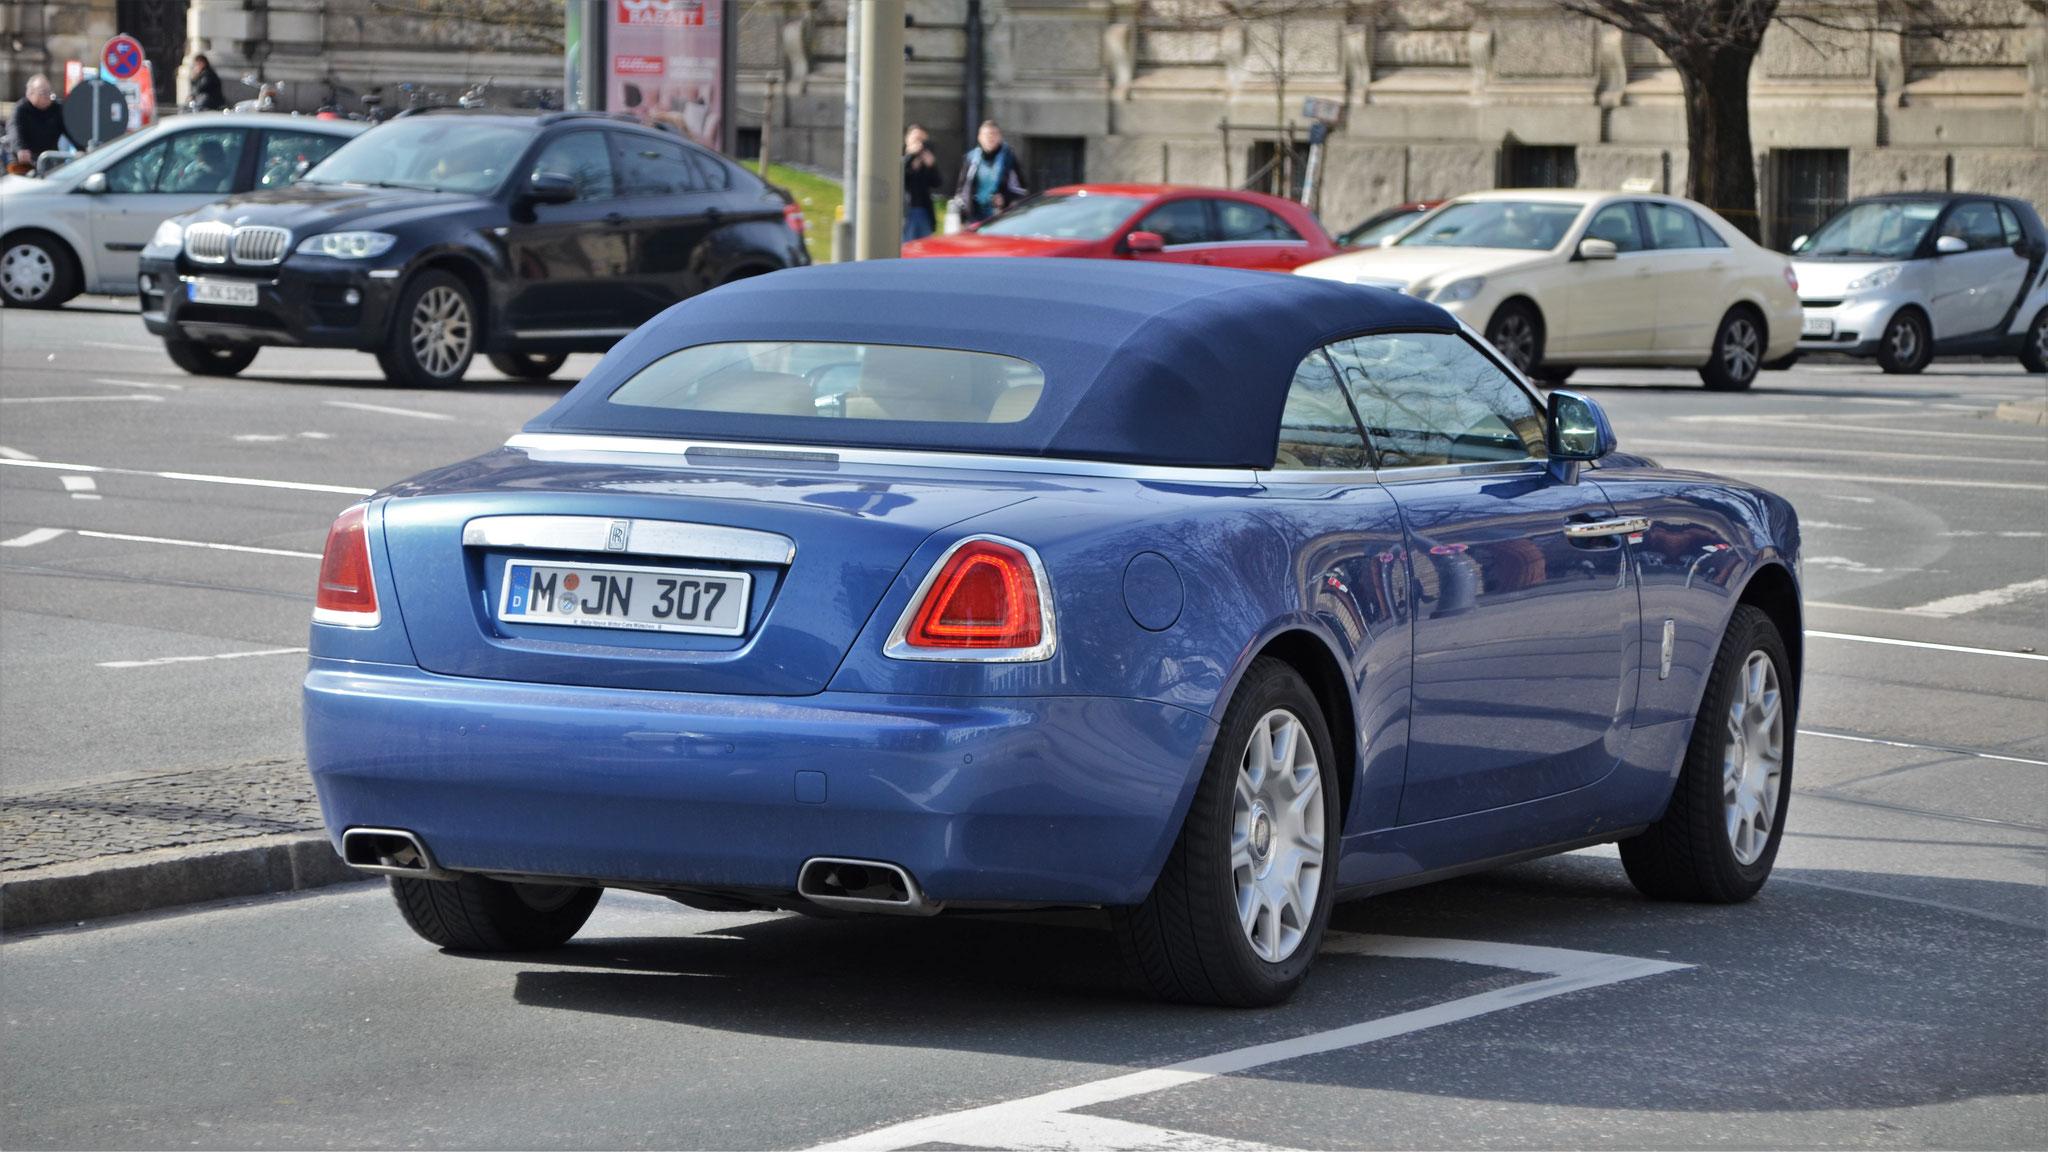 Rolls Royce Dawn - M-JN-307